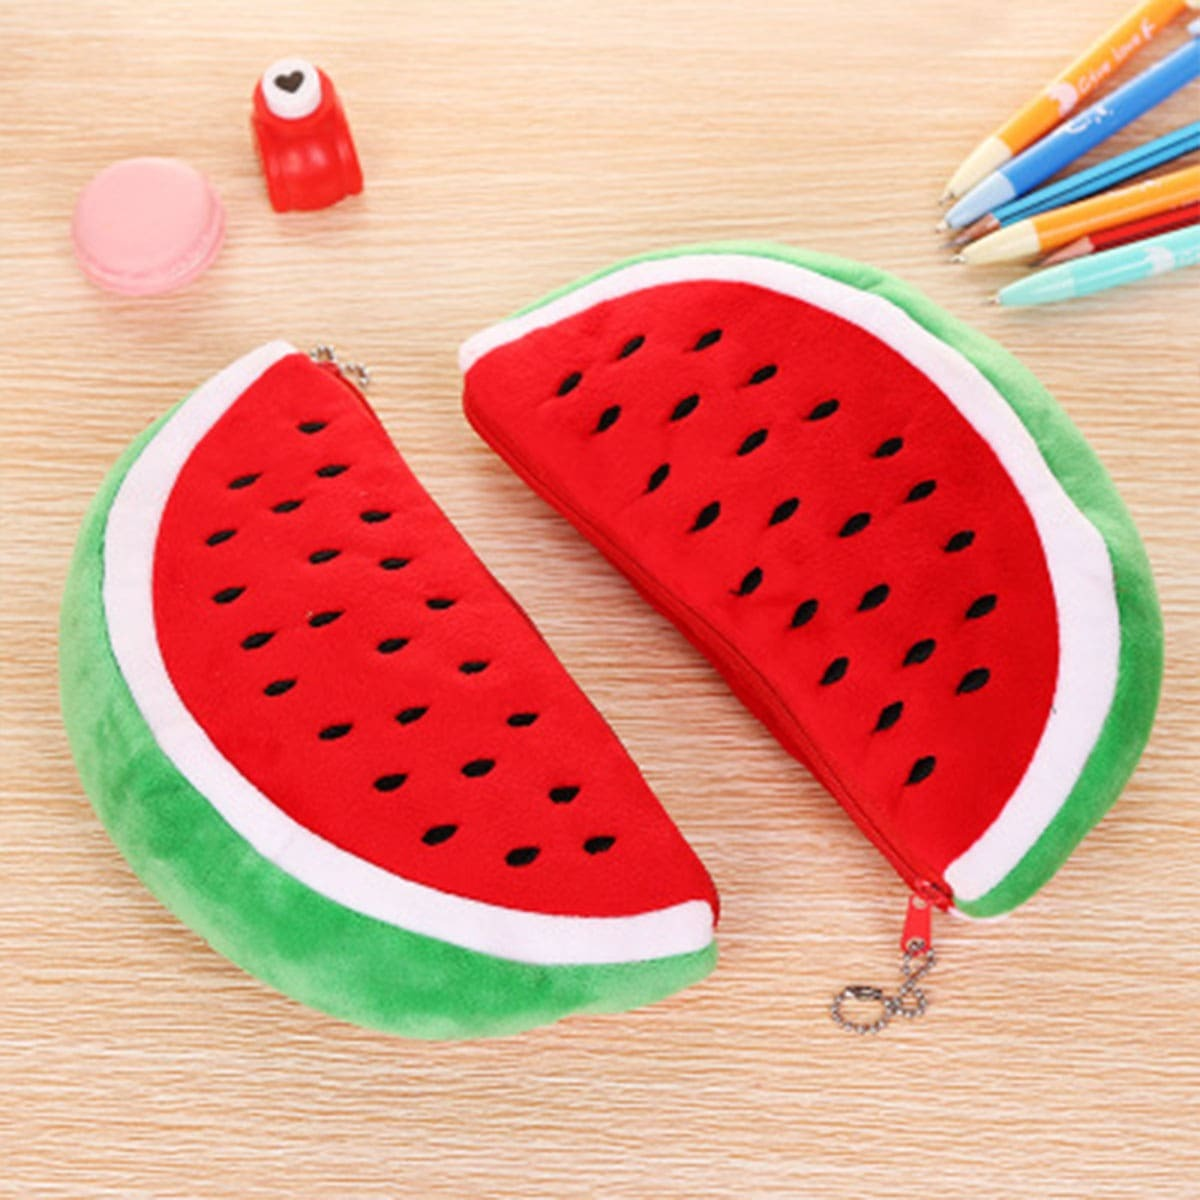 Watermeloengevormde etui 1pc